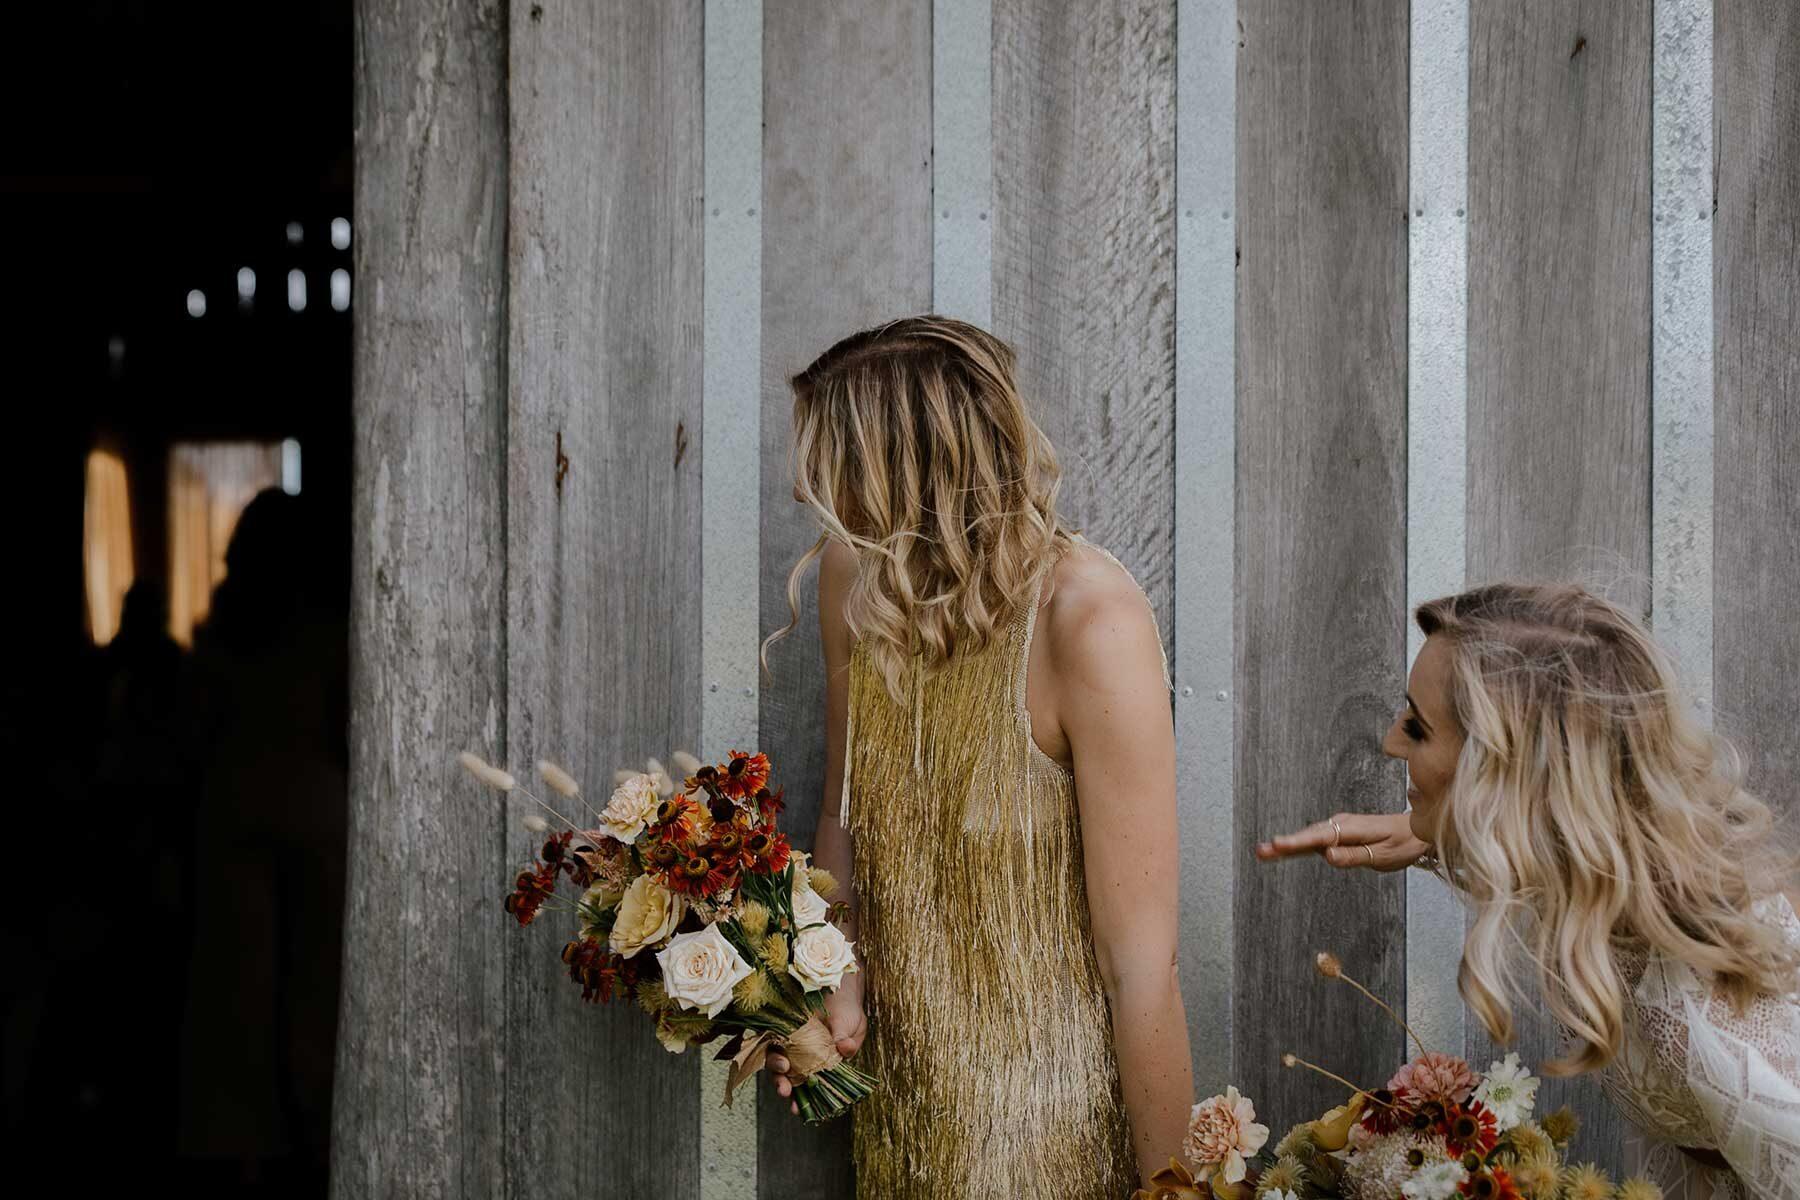 boho vegan festival wedding at Albion Farm Gardens in the Hunter Valley NSW